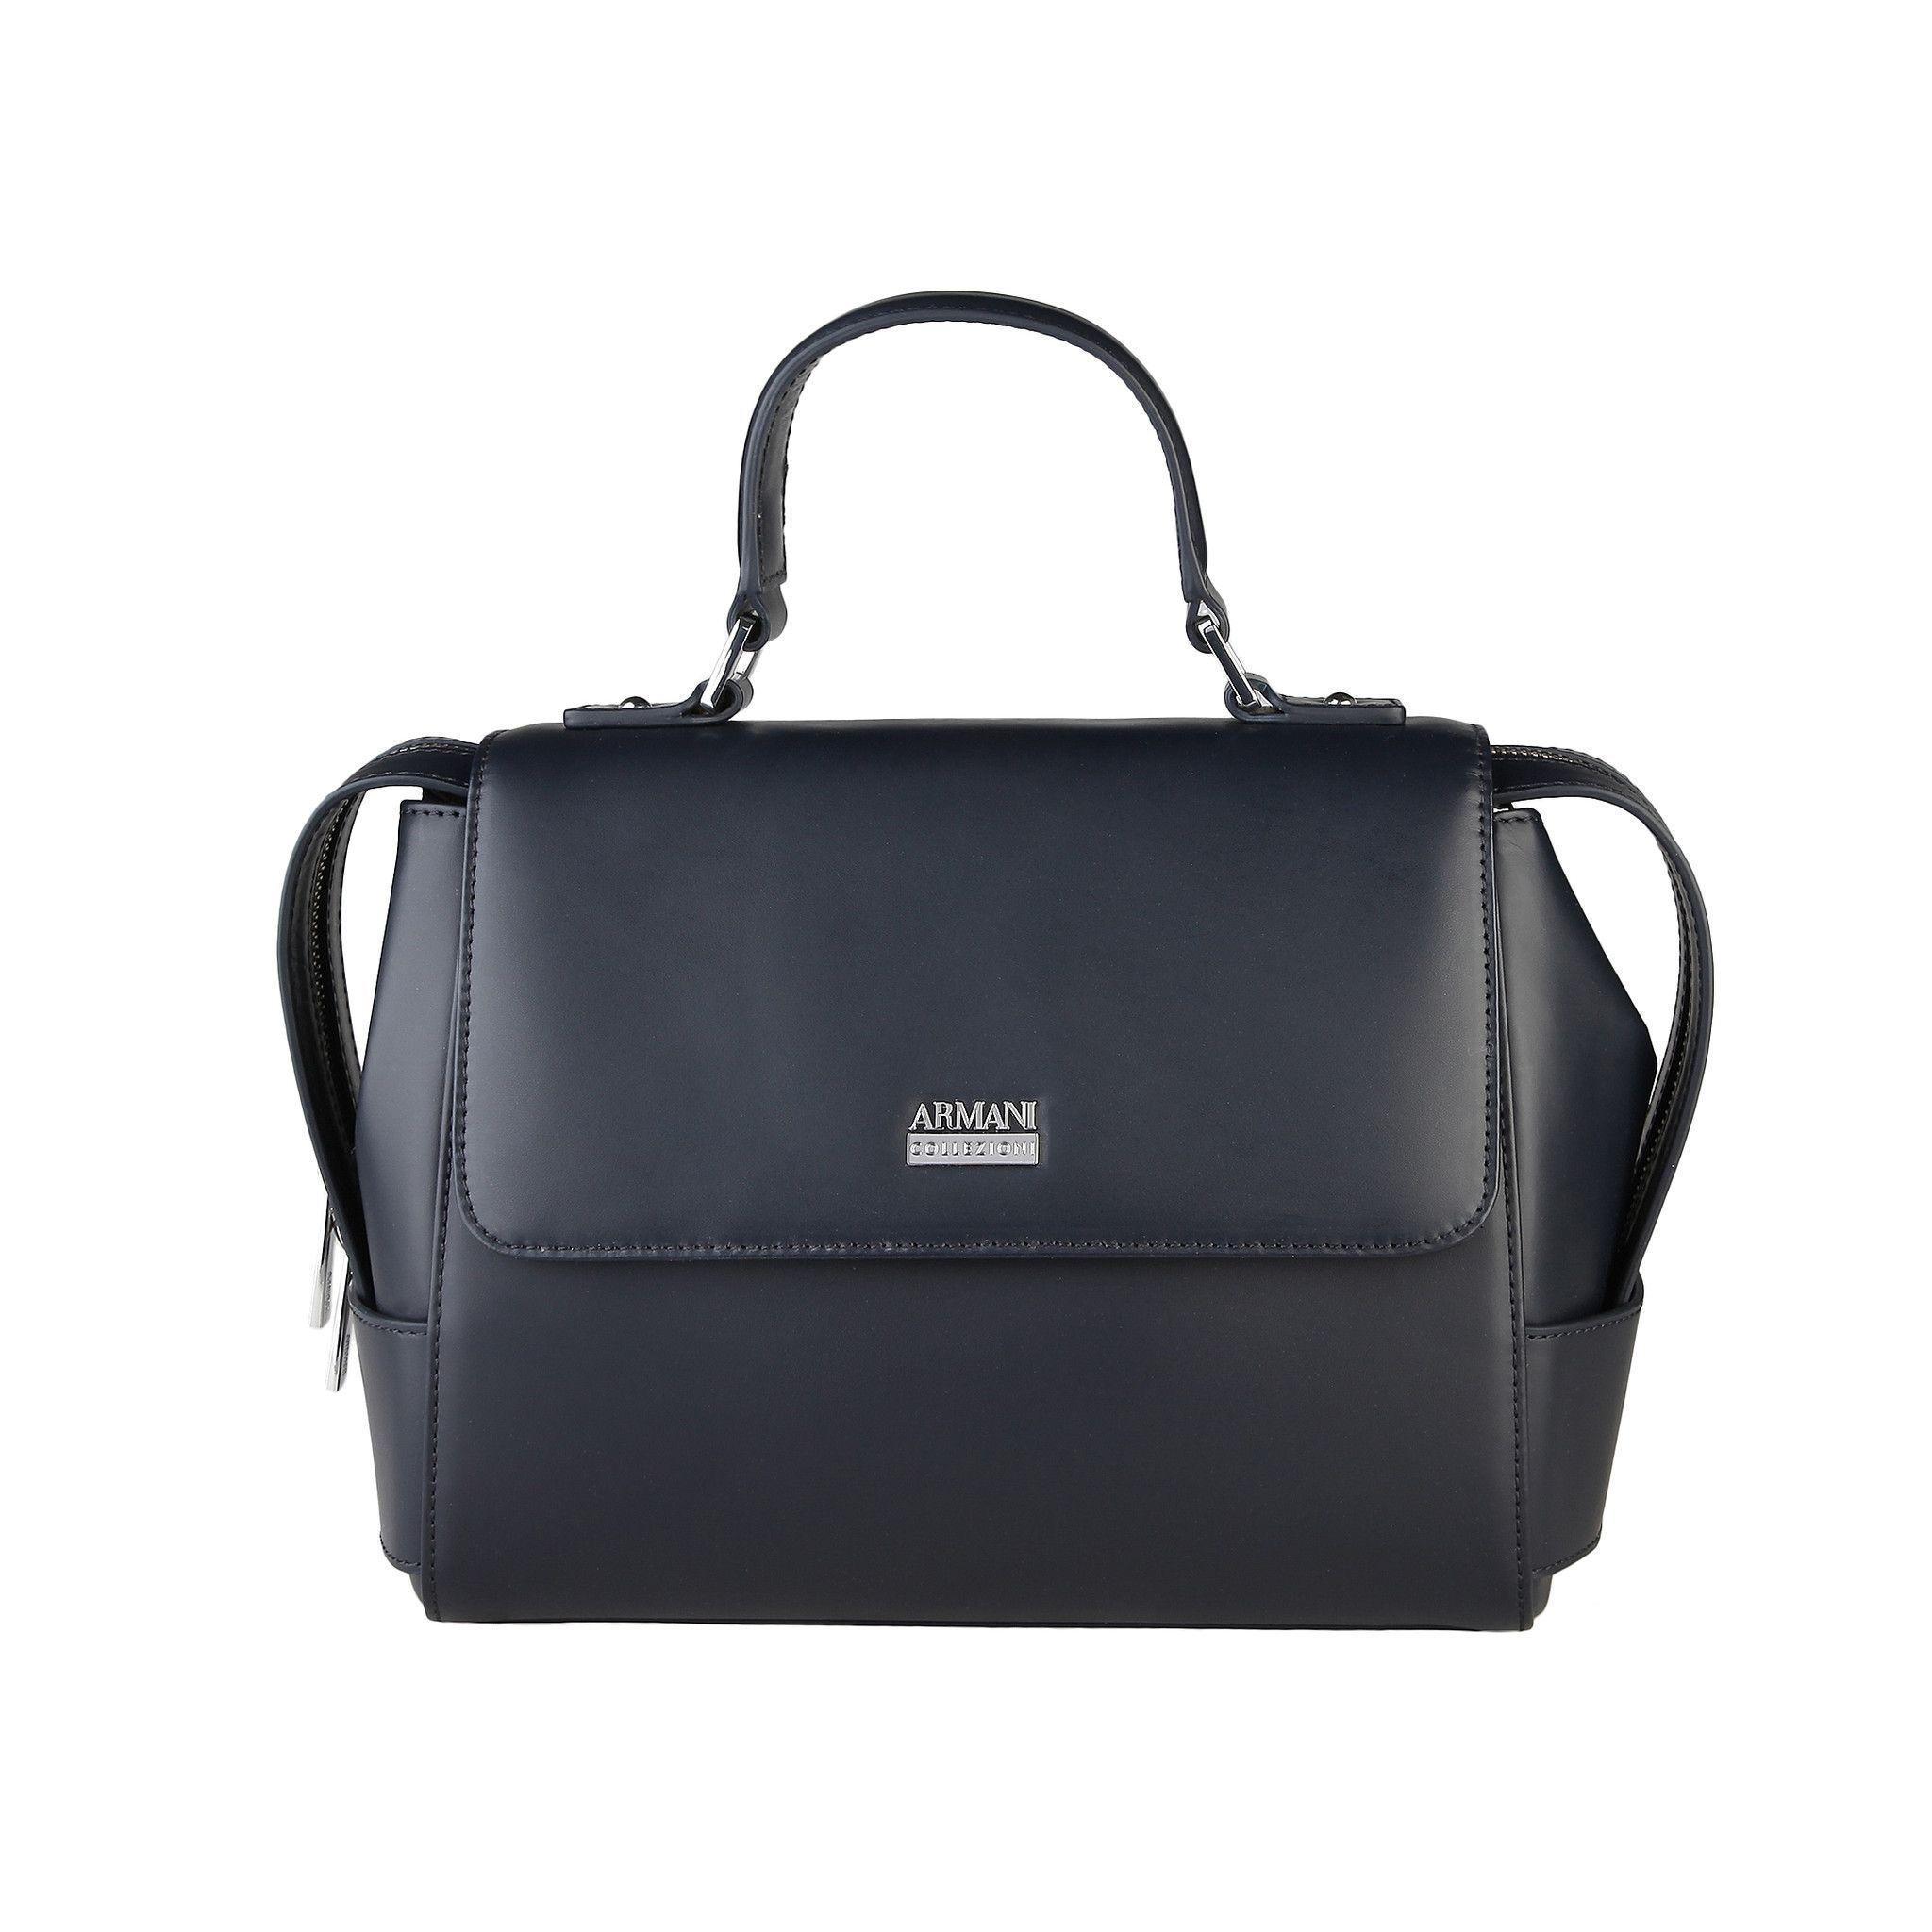 Armani Handbags On Sale - € 312.30 #Armani #Handbags #Fashion #Women #Designer #Offers #FreeShipping